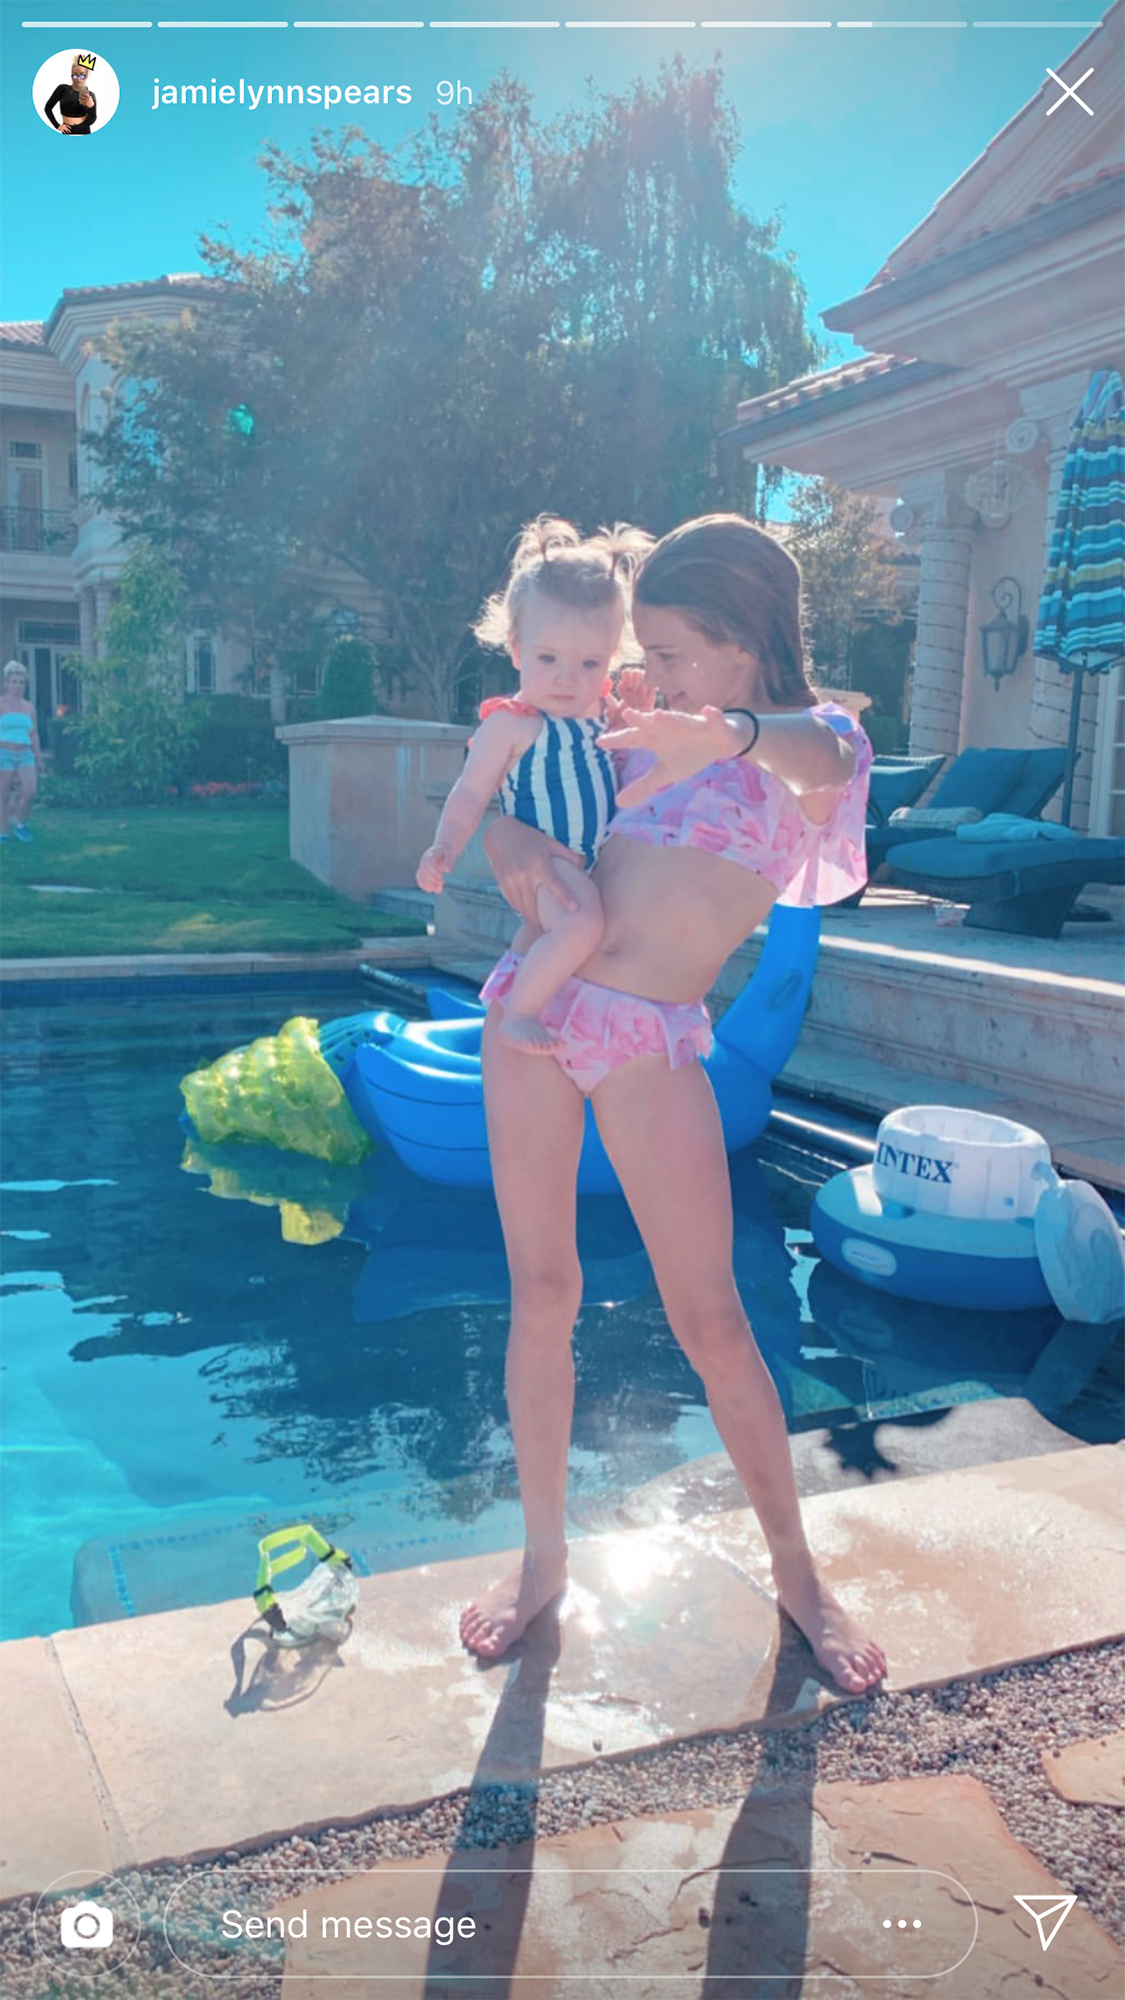 Jamie Lynn Spears Daughters Pool Party Britney Spears House